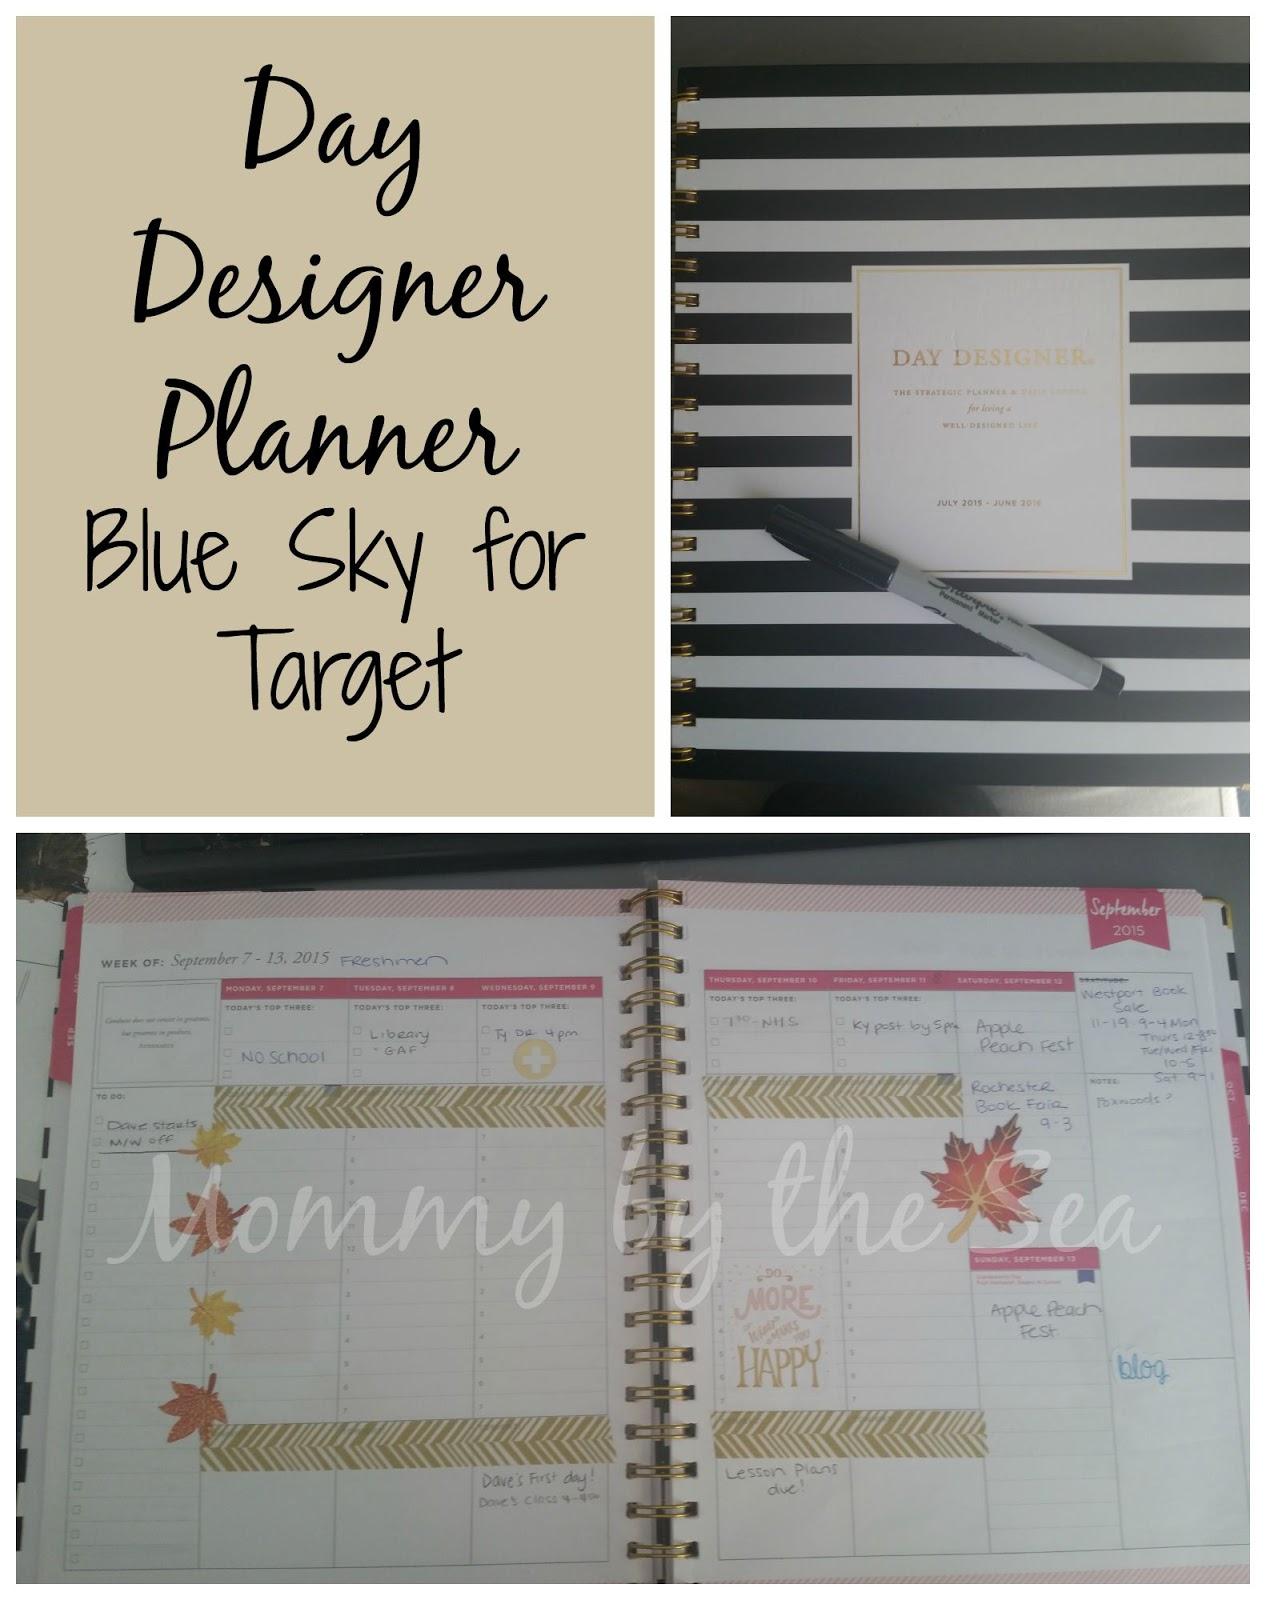 photo regarding Day Designer for Target named The Occupied Giffs: Blue Sky for Concentration Working day Designer Planner